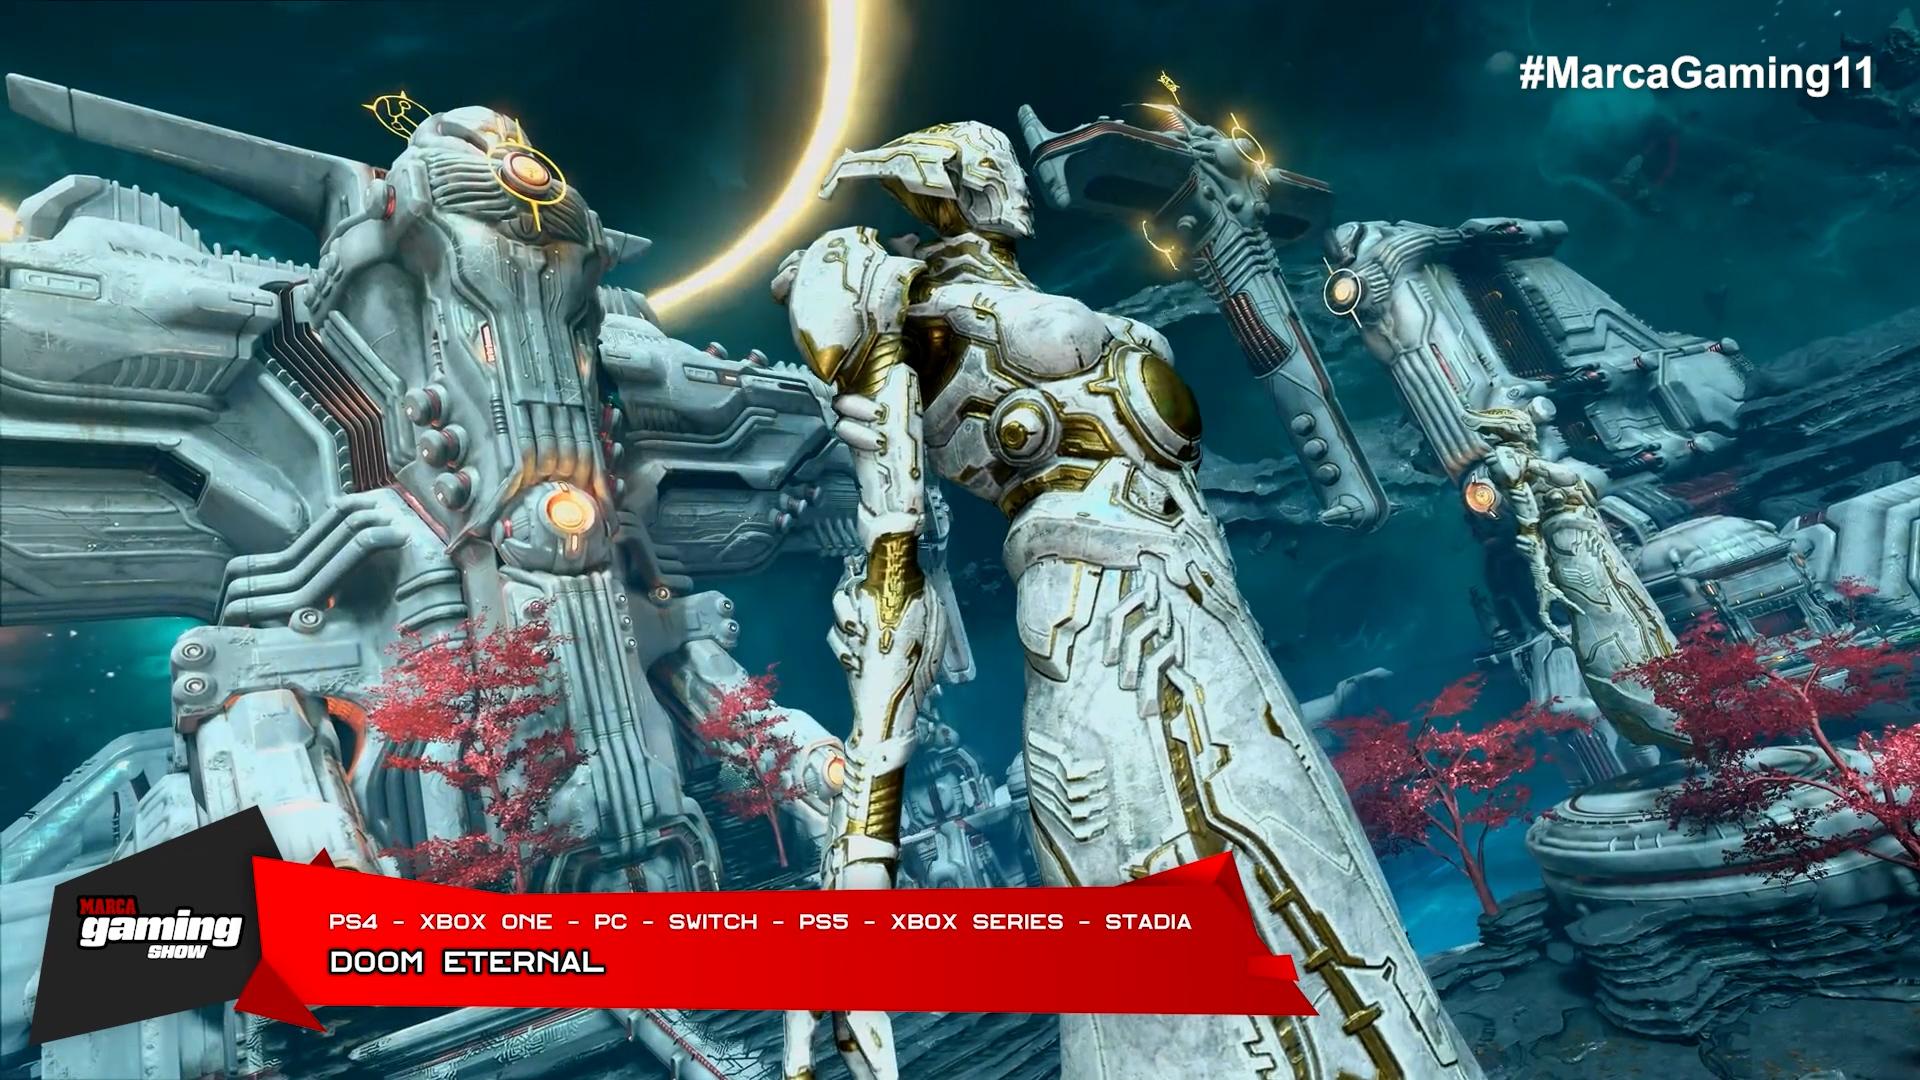 Doom Eternal (PS4 - XBOX ONE - PC - SWITCH - PS5 - XBOX SERIES - STADIA